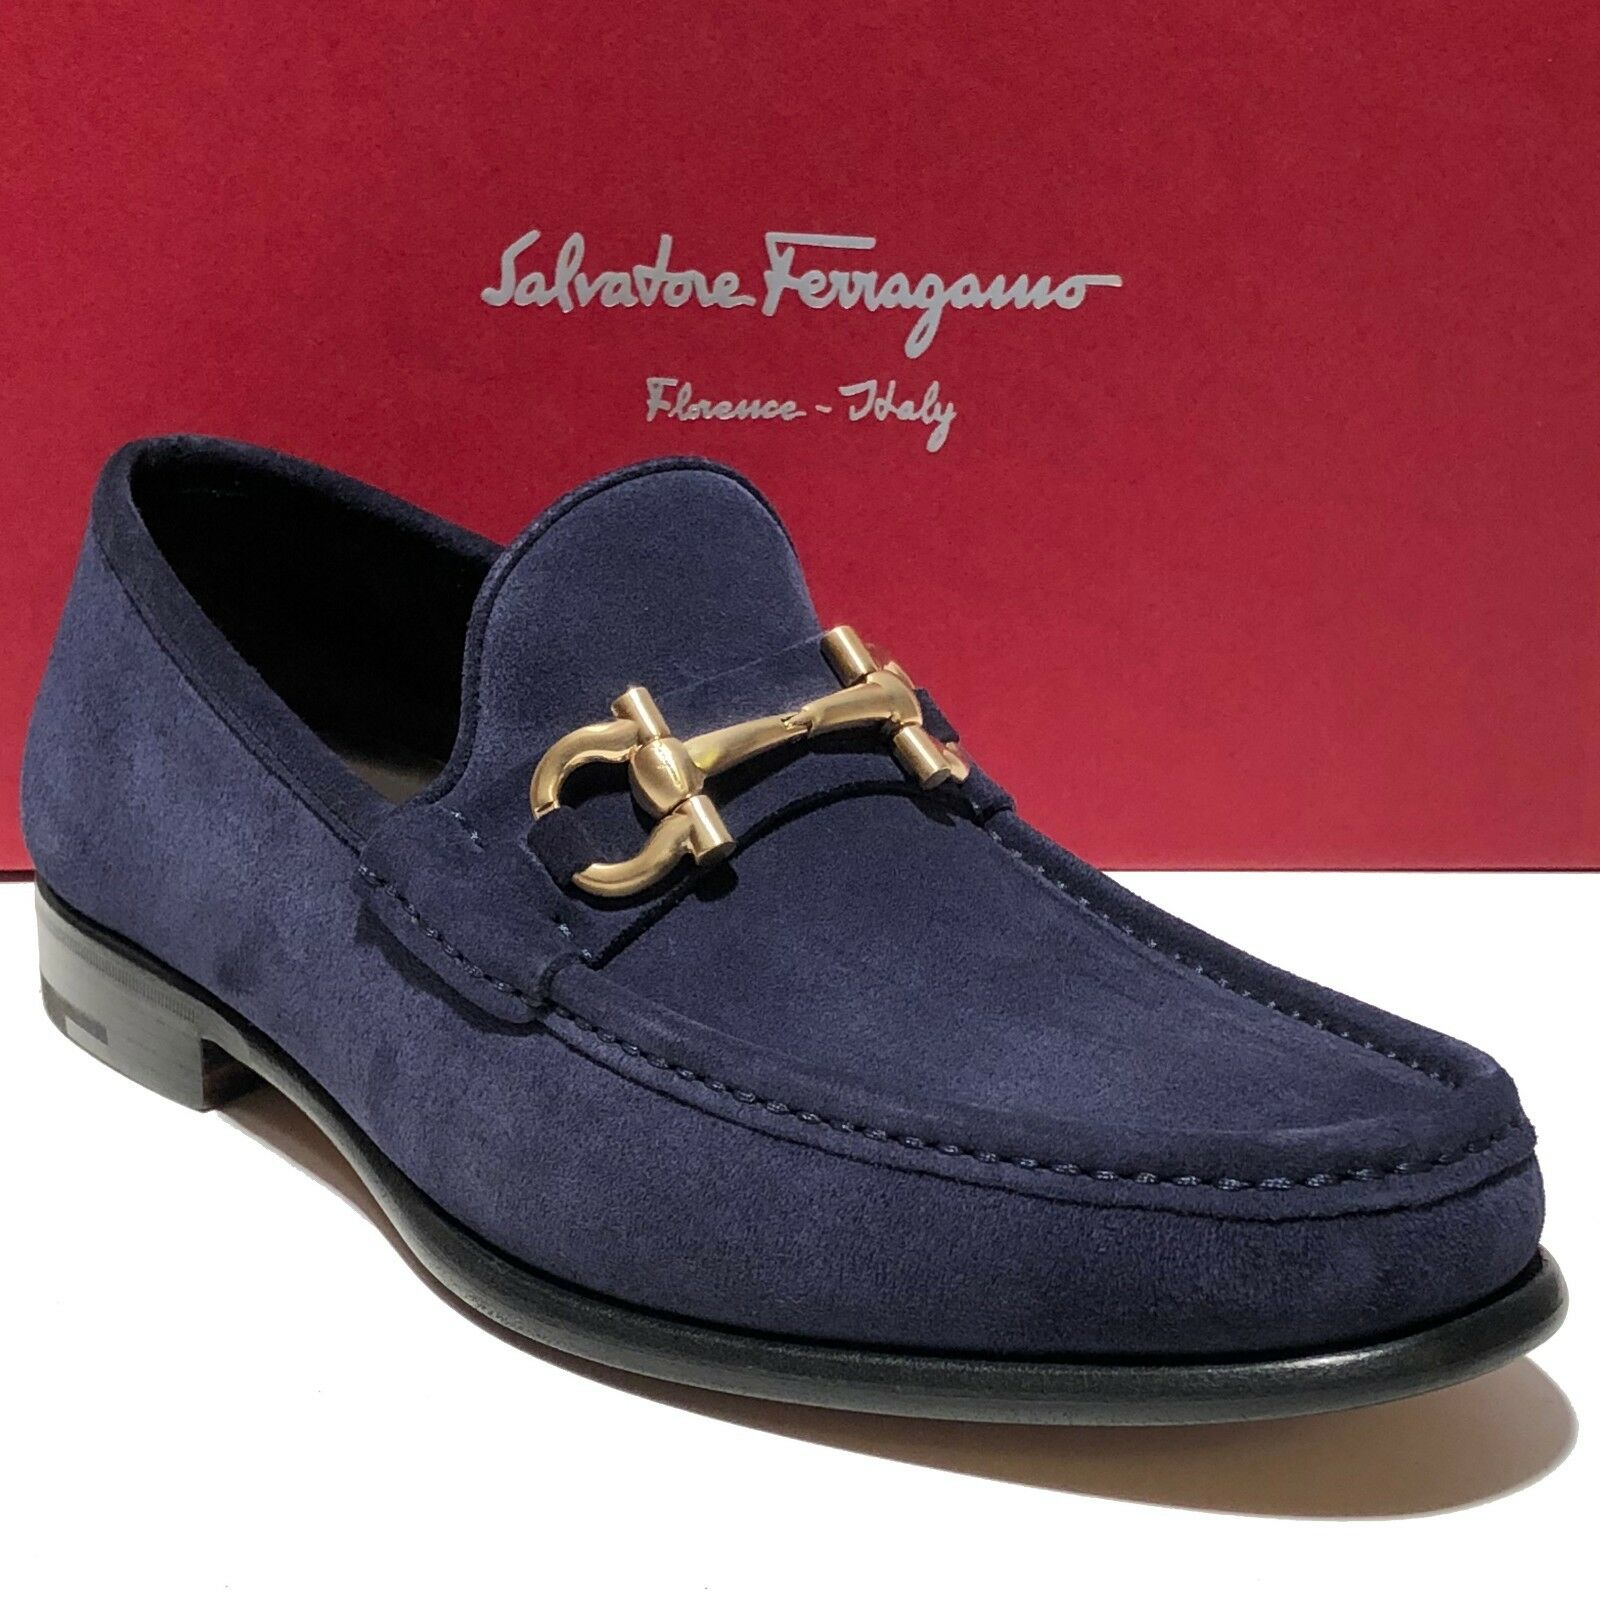 Ferragamo MASON blu Gancini Bit Dress Loafers 9 EE Men's Casual Moccasin Master